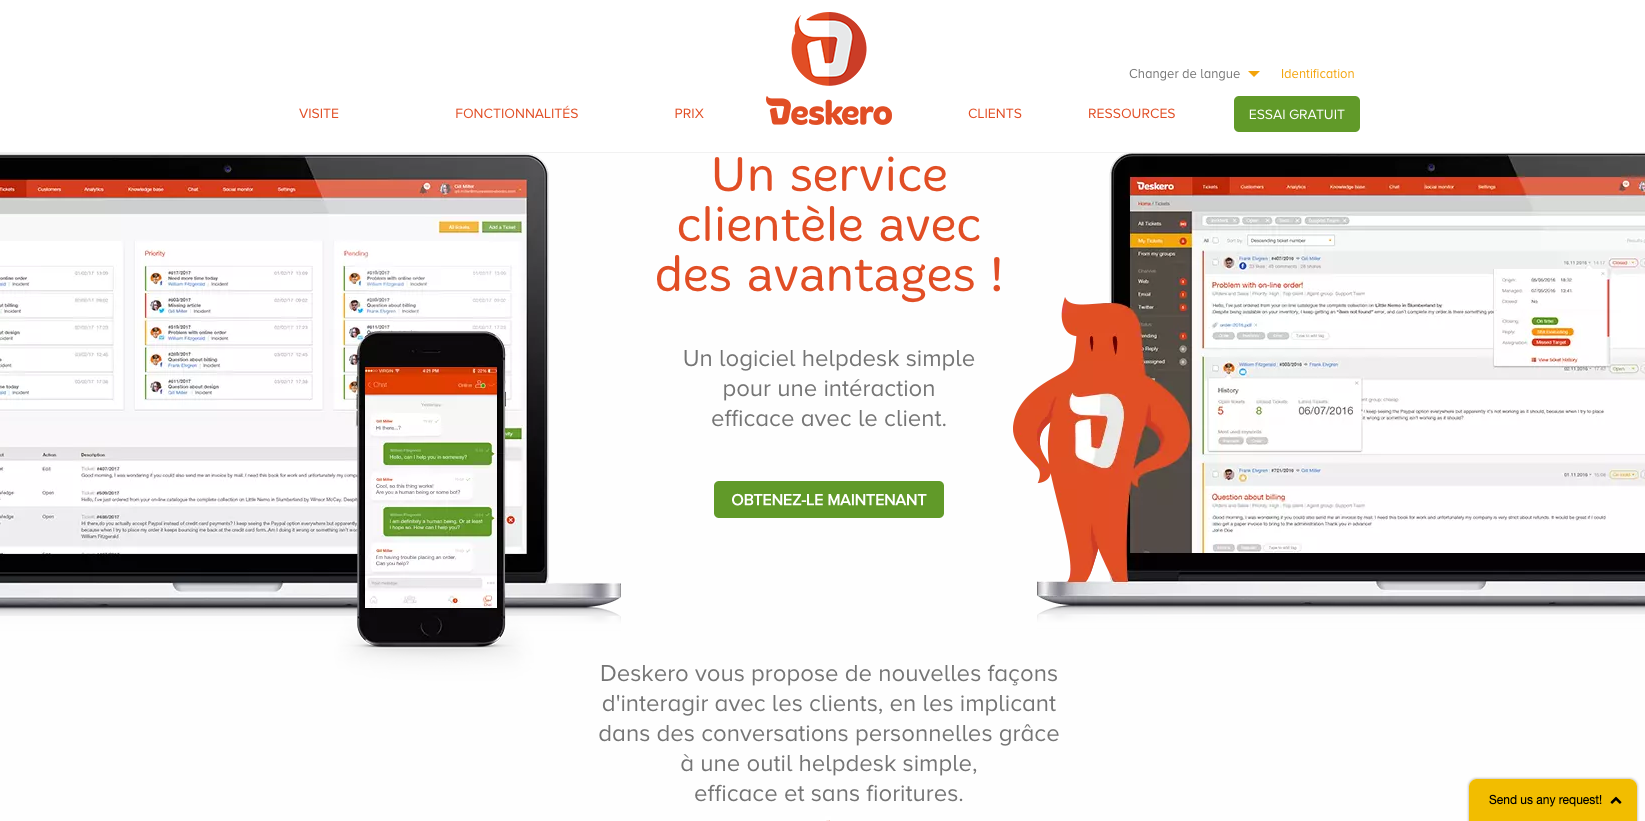 Translations English-French-Spanish for Deskero